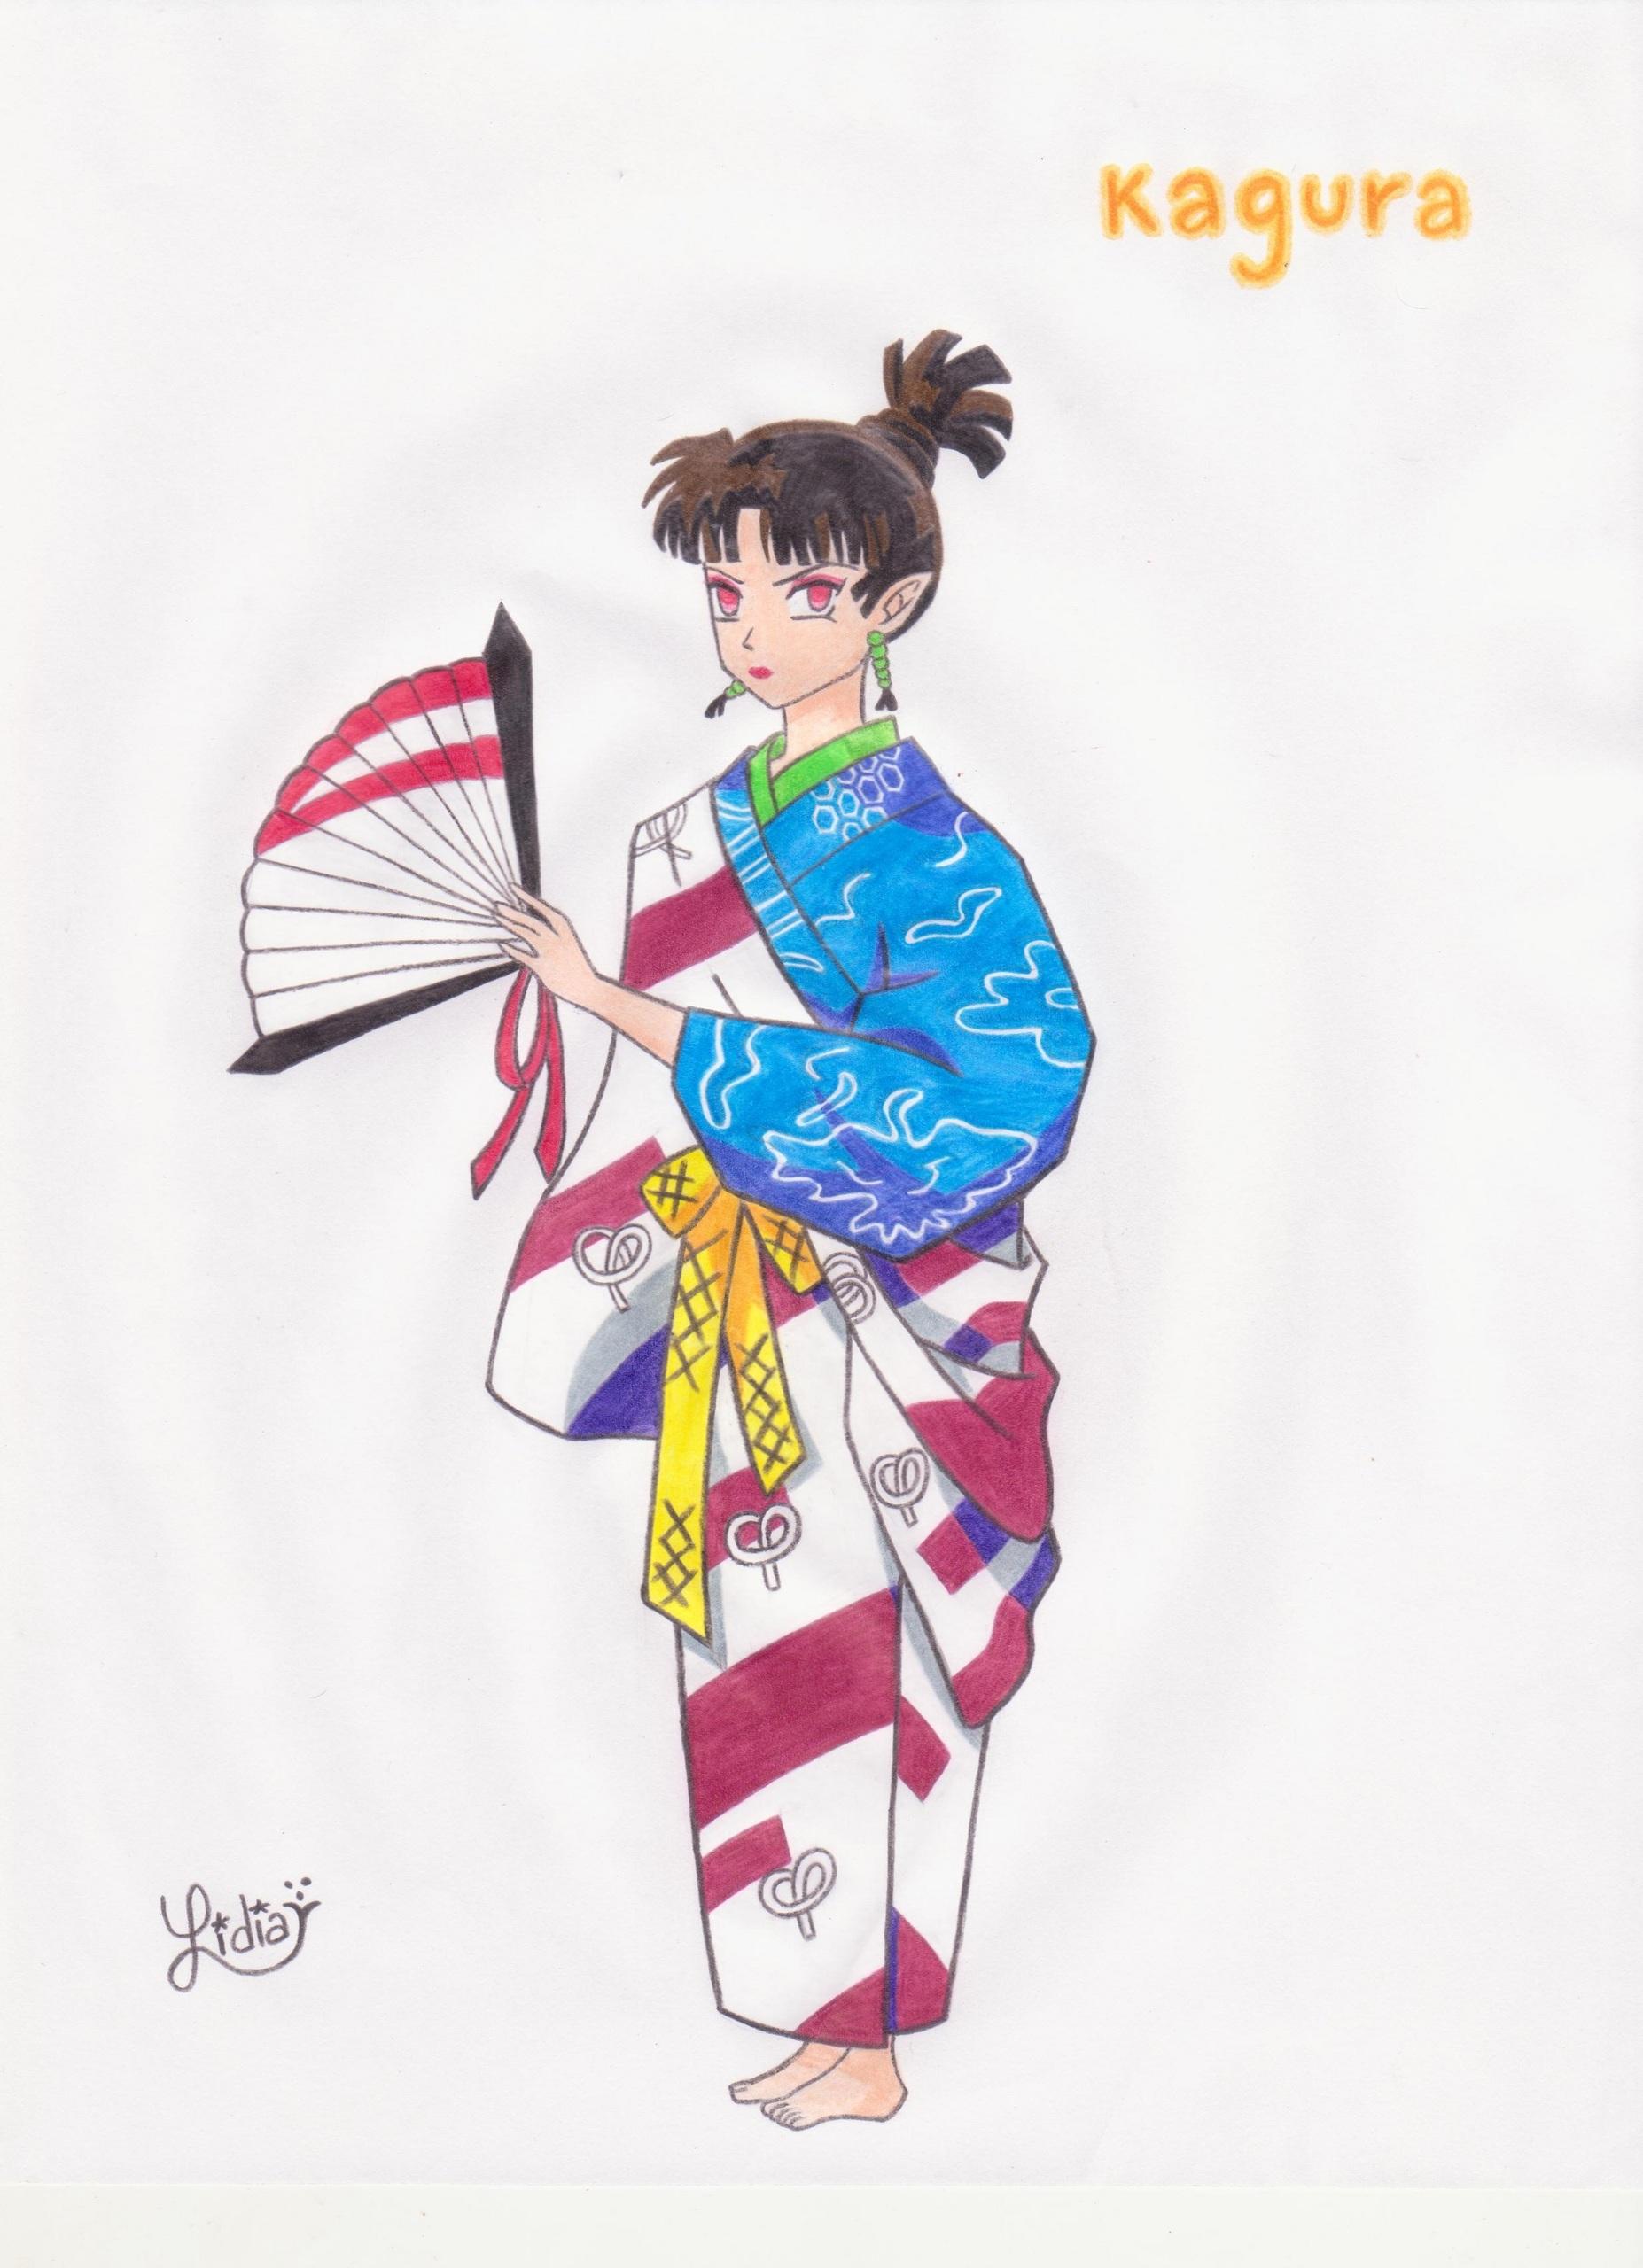 Inuyasha images Kagura HD wallpaper and background photos (28097741)